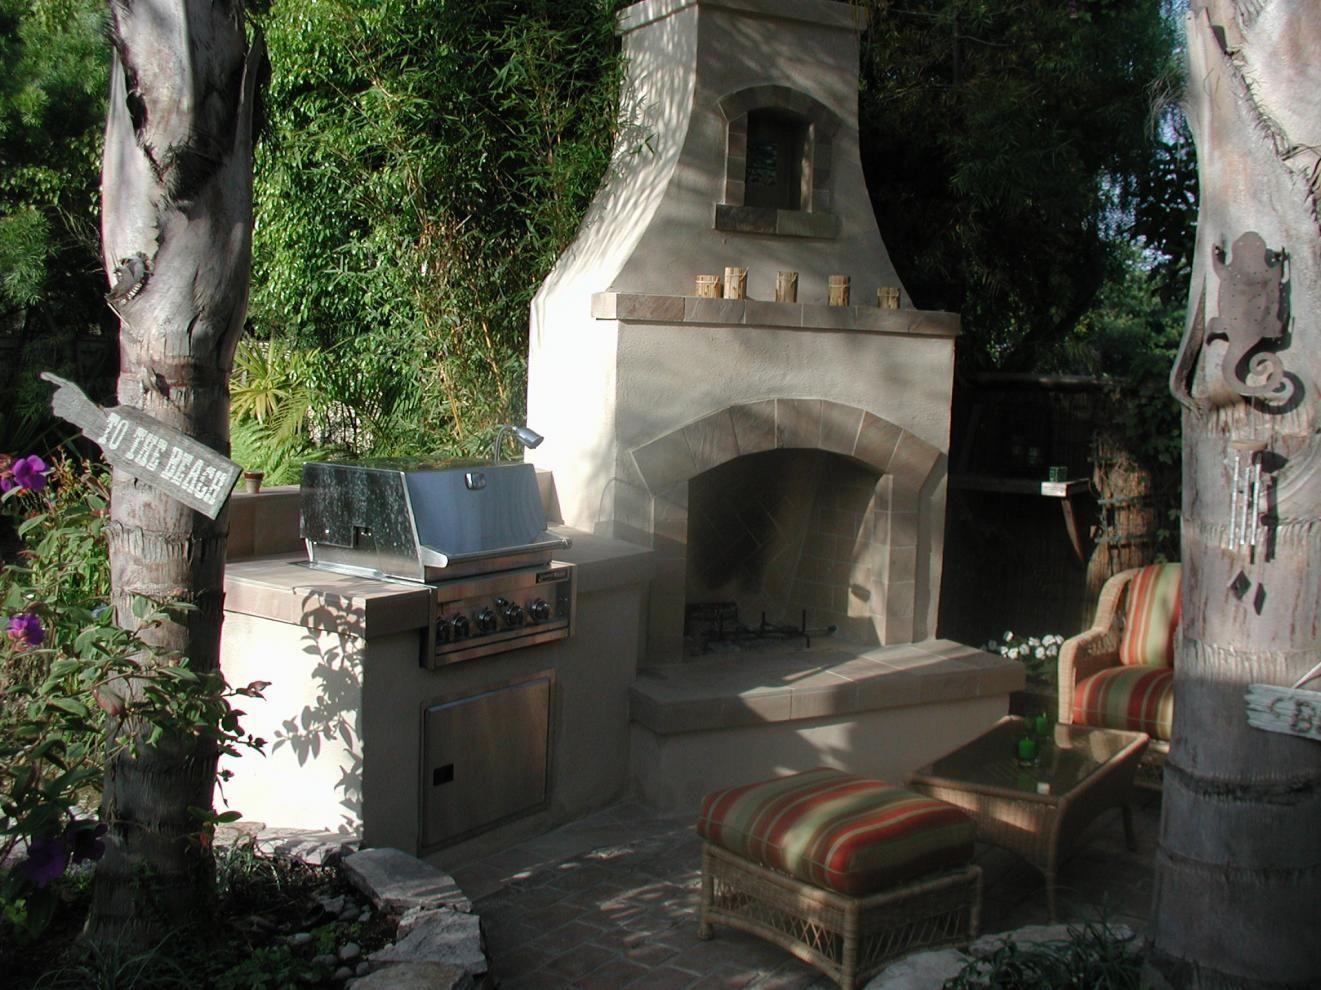 Outdoor Fireplaces | MODULAR OUTDOOR FIREPLACE KIT | MASONRY OUTDOOR  FIREPLACE.